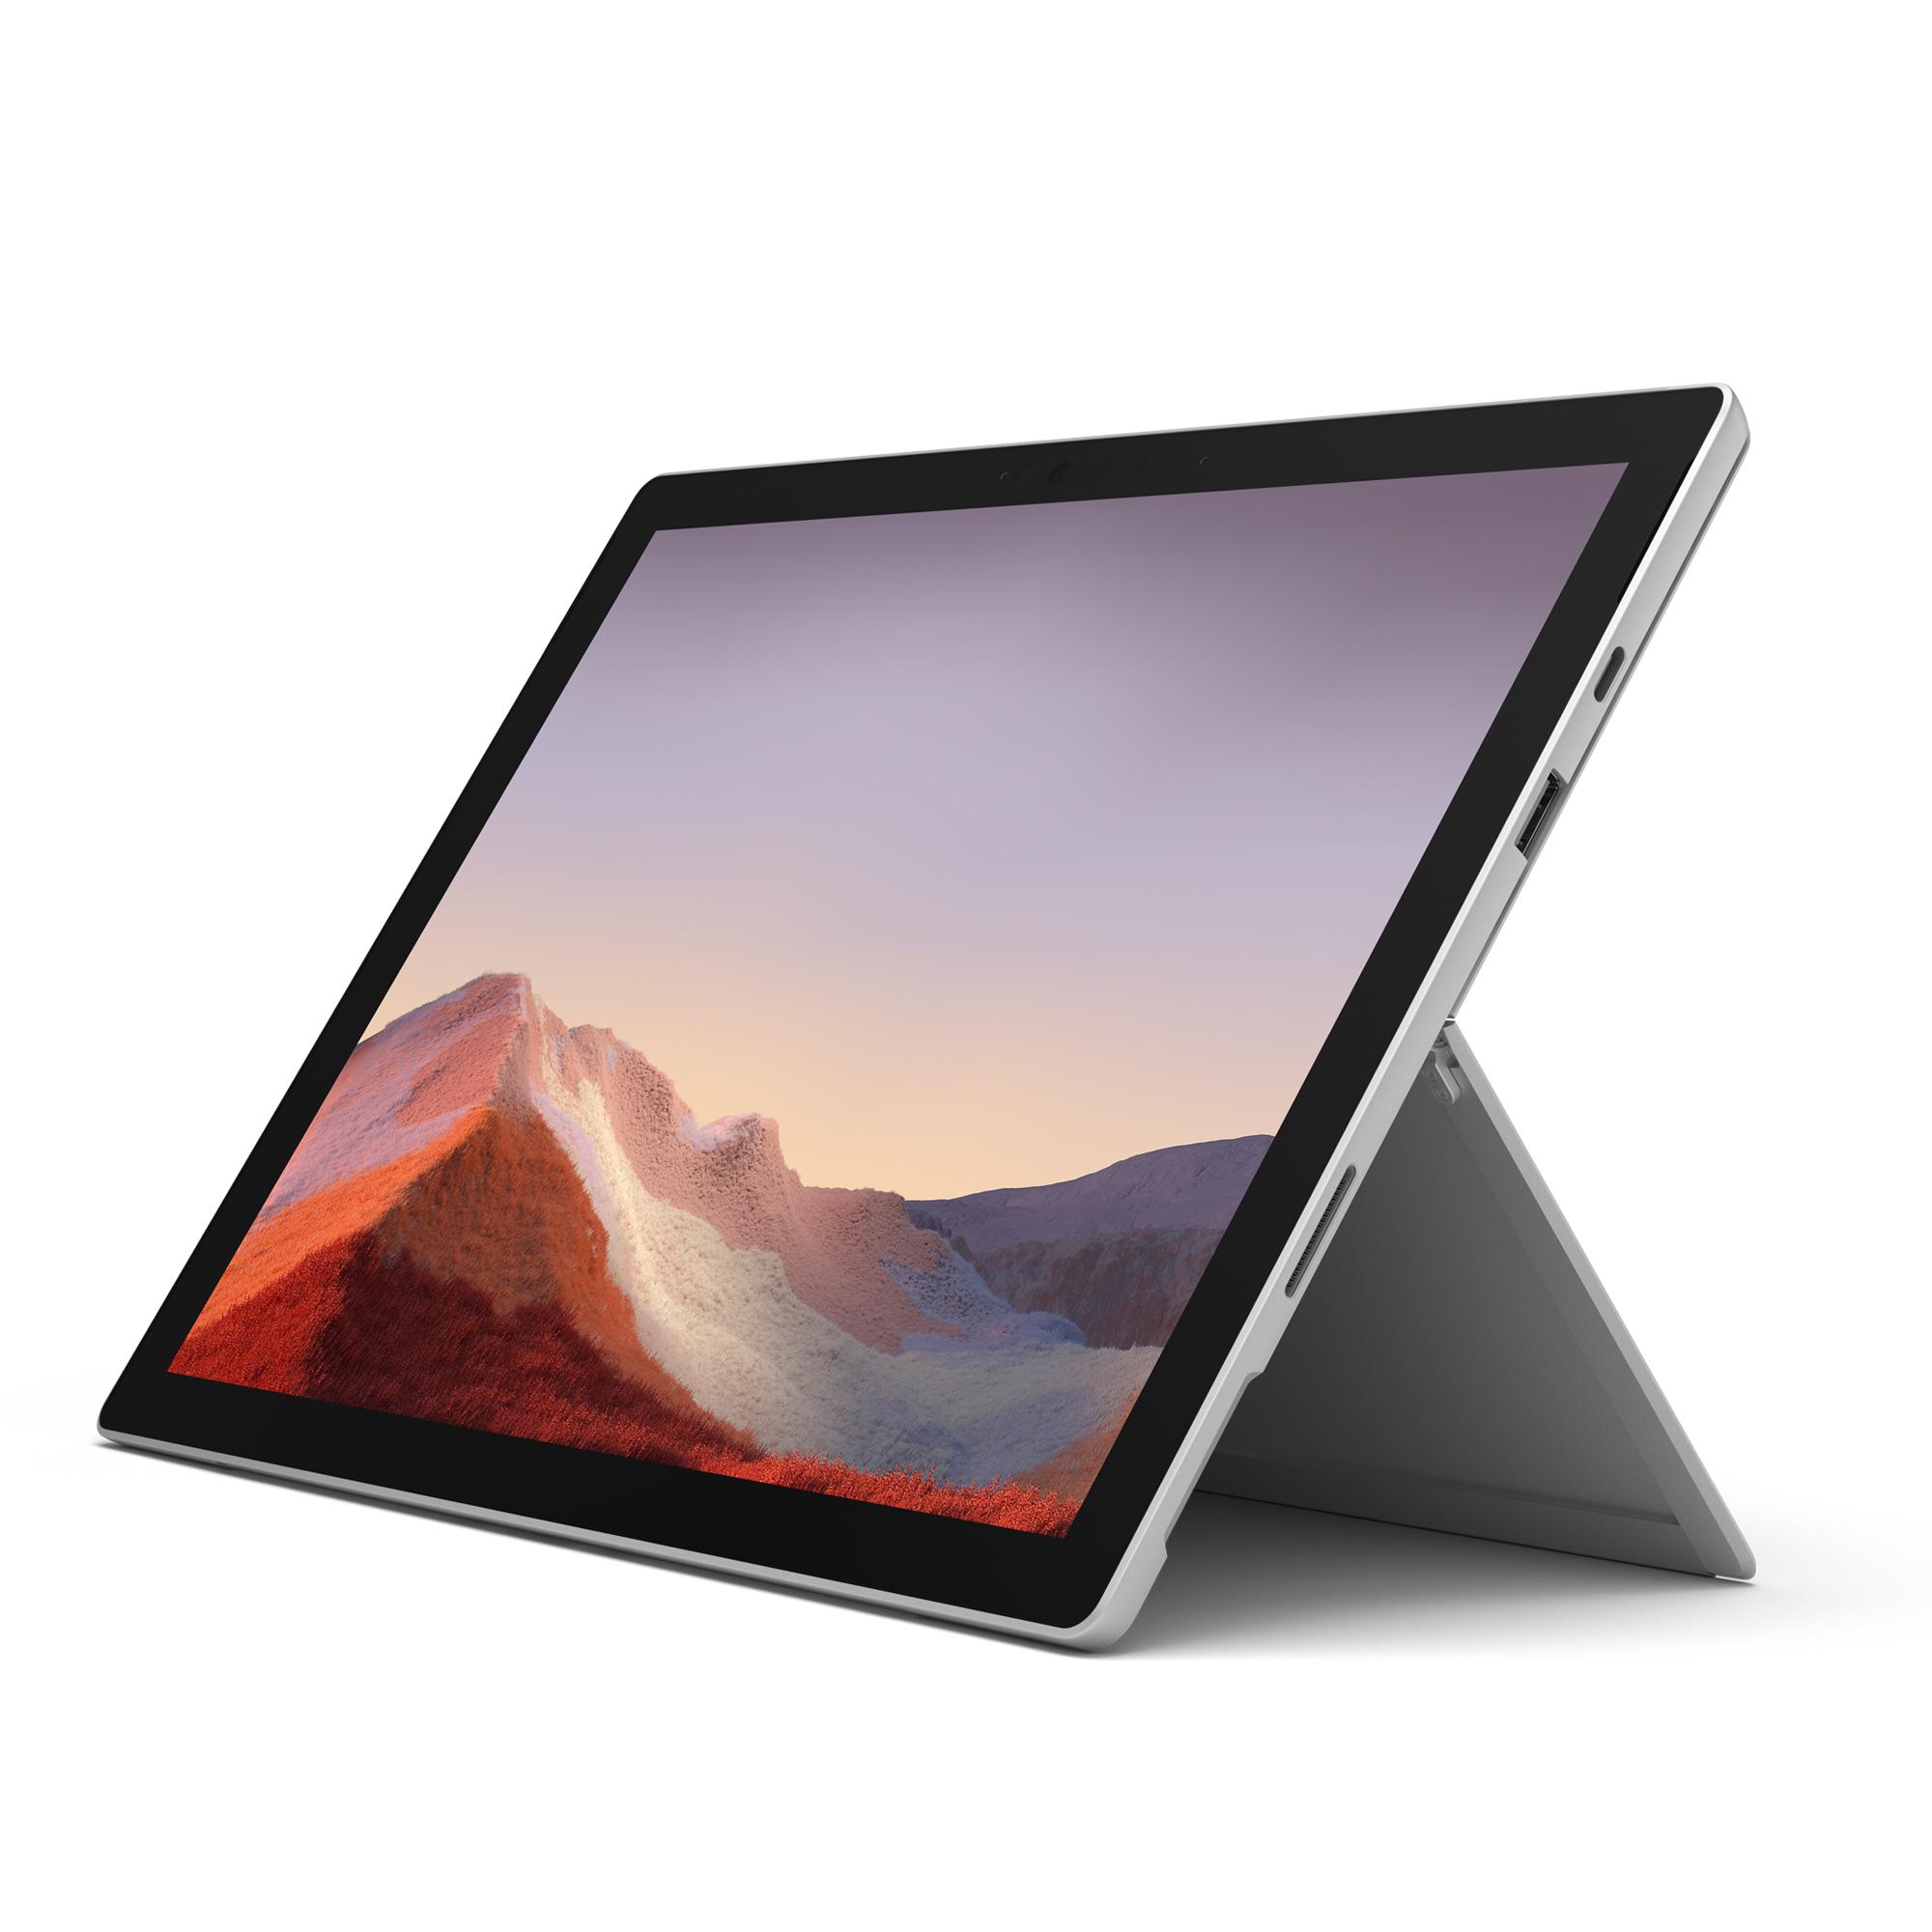 "Microsoft Surface Pro 7 31,2 cm (12.3"") Intel® Core™ i7 de 10ma Generación 16 GB 1024 GB Wi-Fi 6 (802.11ax) Platino Windows 10 Pro"